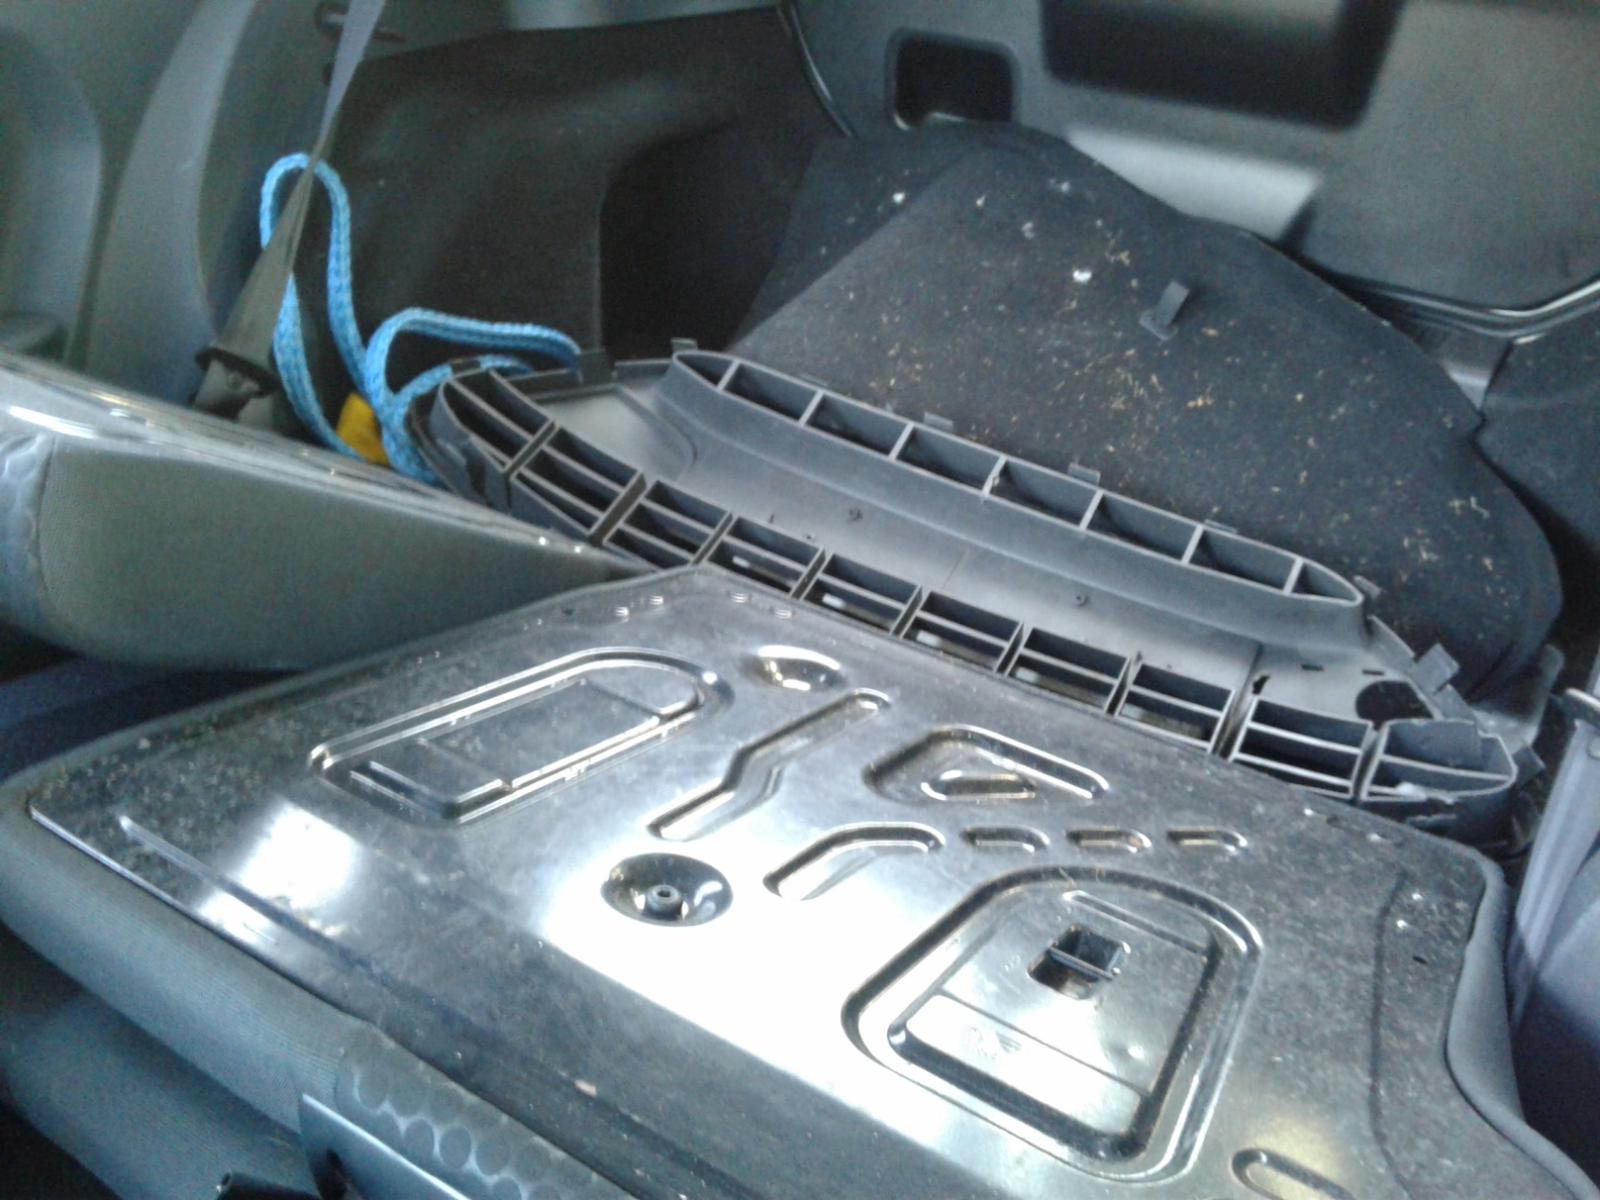 View Auto part FORD FIESTA 2010 3 Door Hatchback